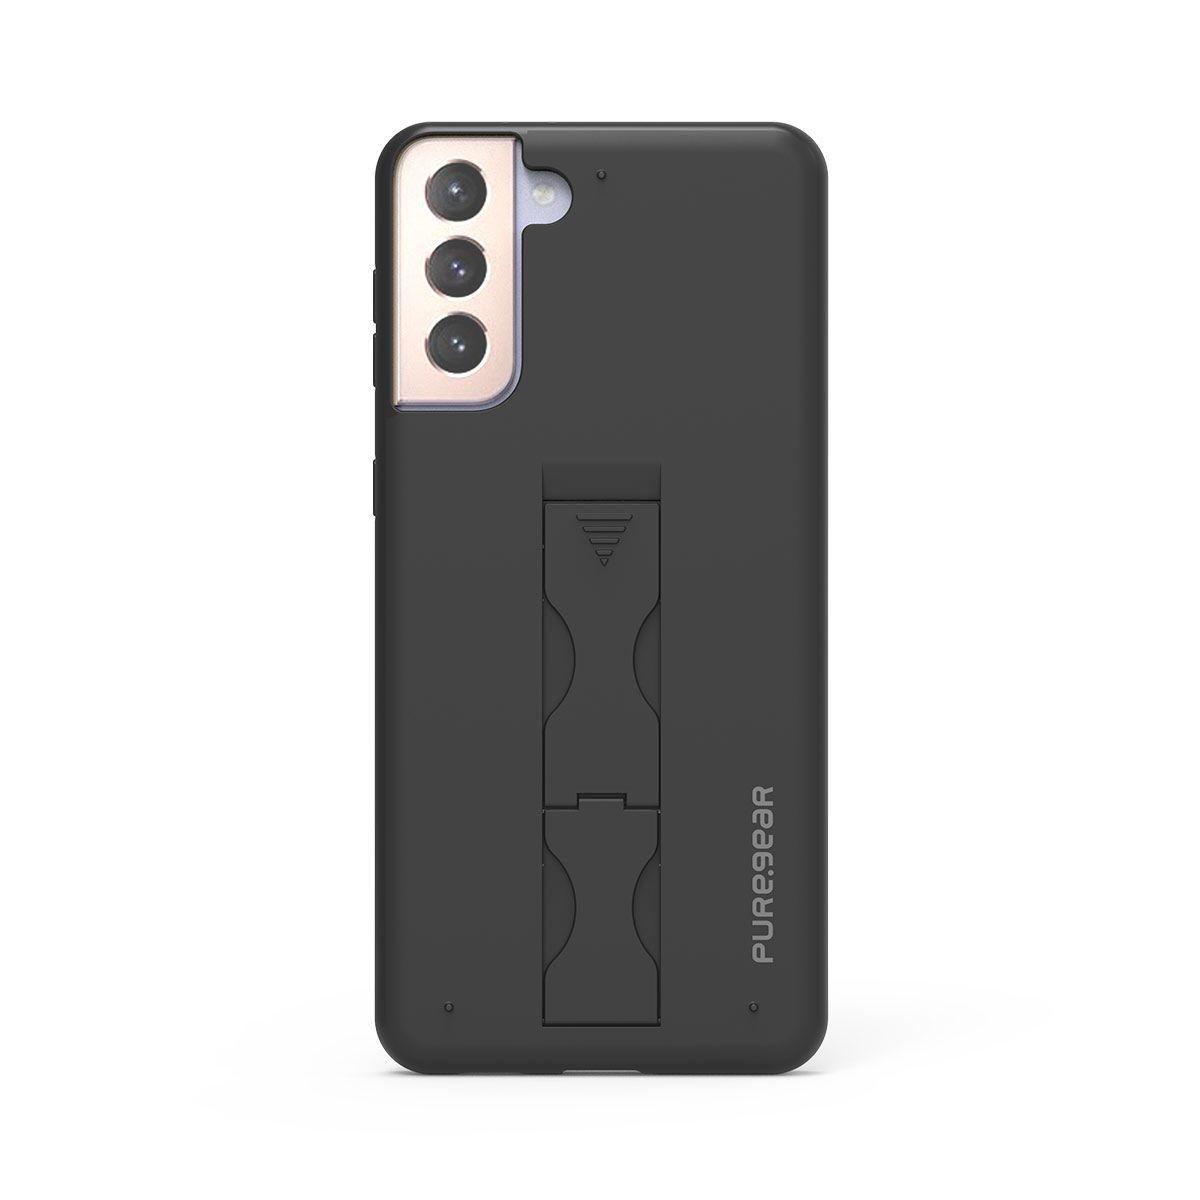 Samsung Galaxy S21+ 5G SlimStik, Antimicrobial Kickstand Case – Soft Touch Black